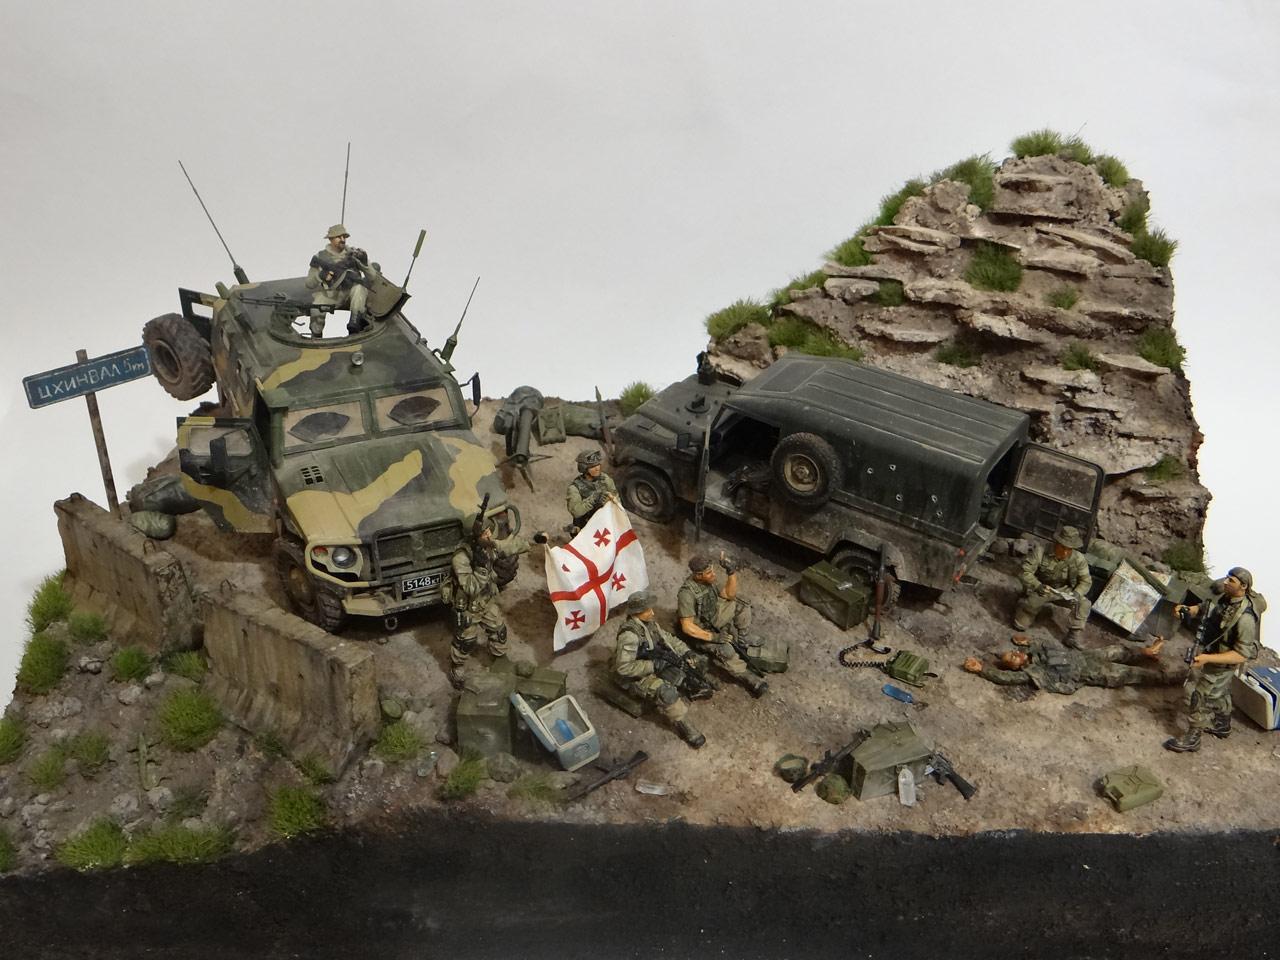 http://www.diorama.ru/_img/content/gallery/4501/1.jpg